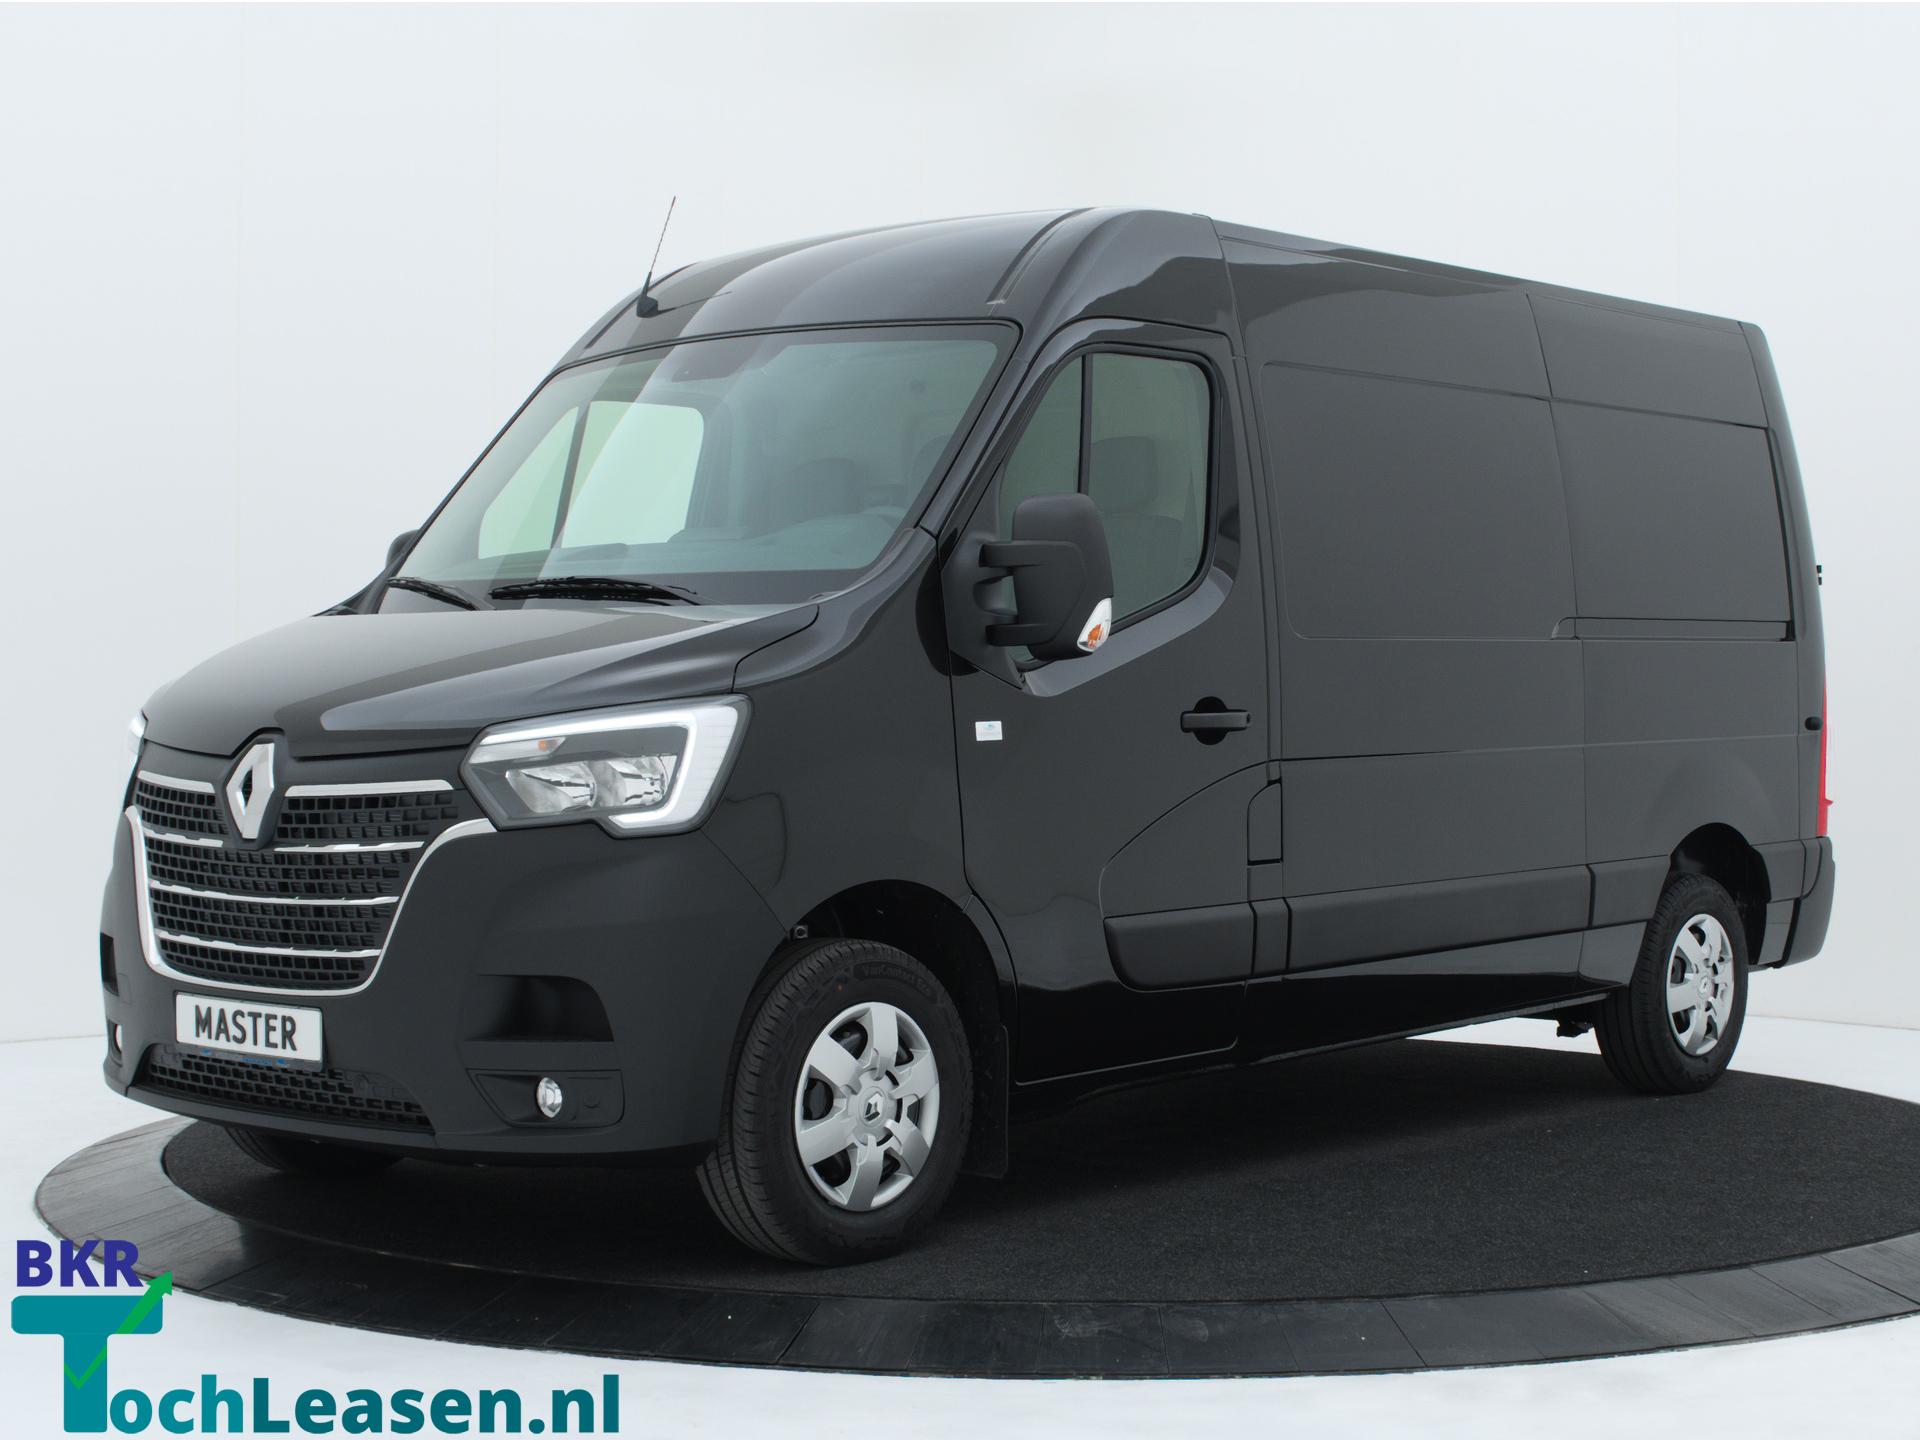 Renault Master L2H2 180 pk zwart voorkant BKR toch Leasen